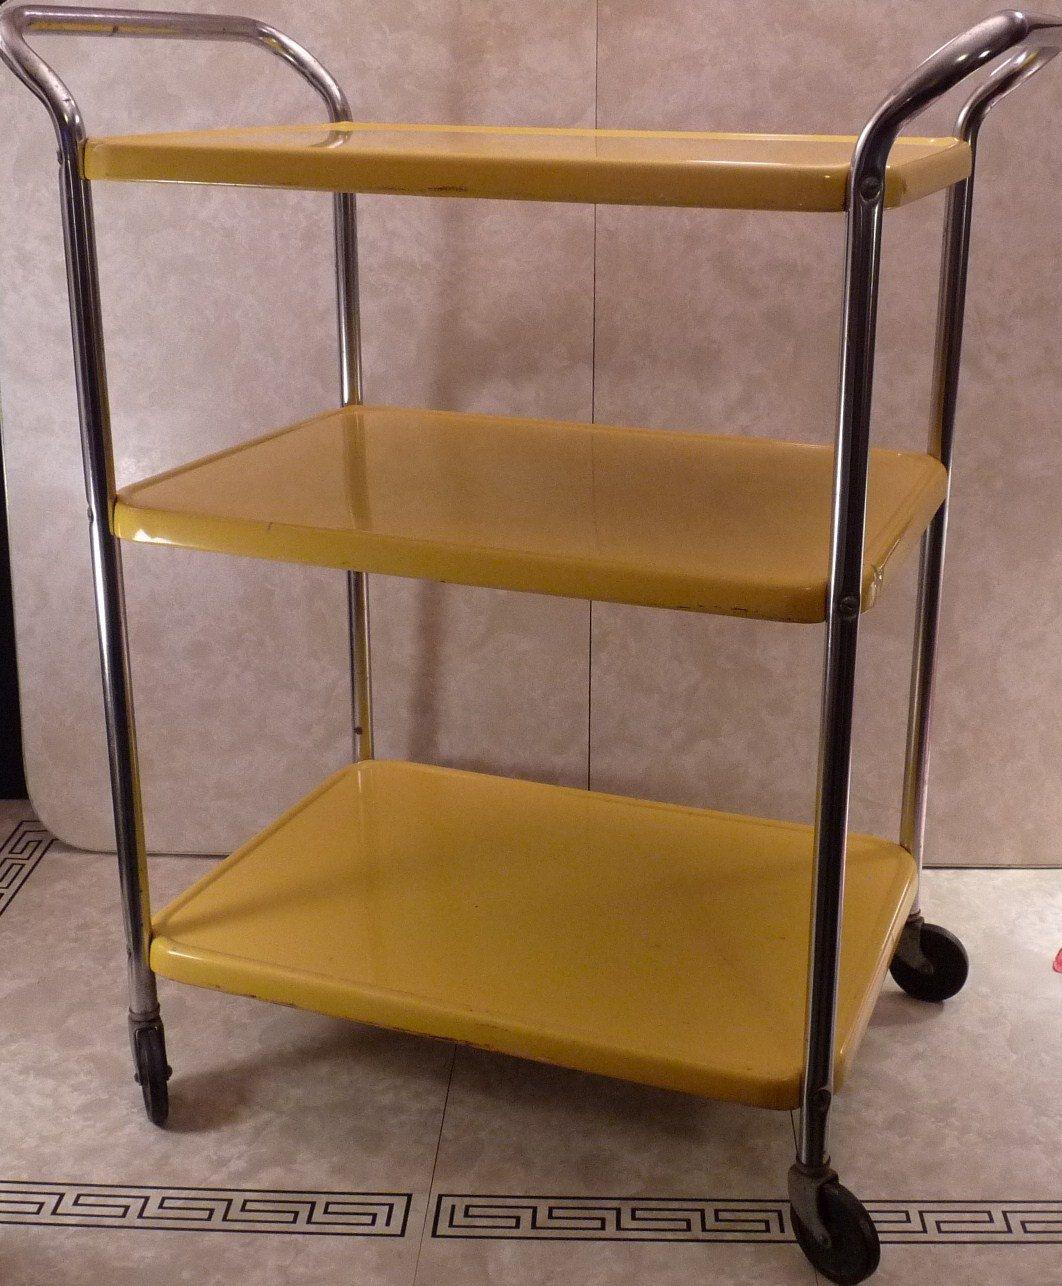 Vintage Metal Kitchen Cart Vintage Mid Century Industrial Bright Yellow Cosco 3 Tier Rolling